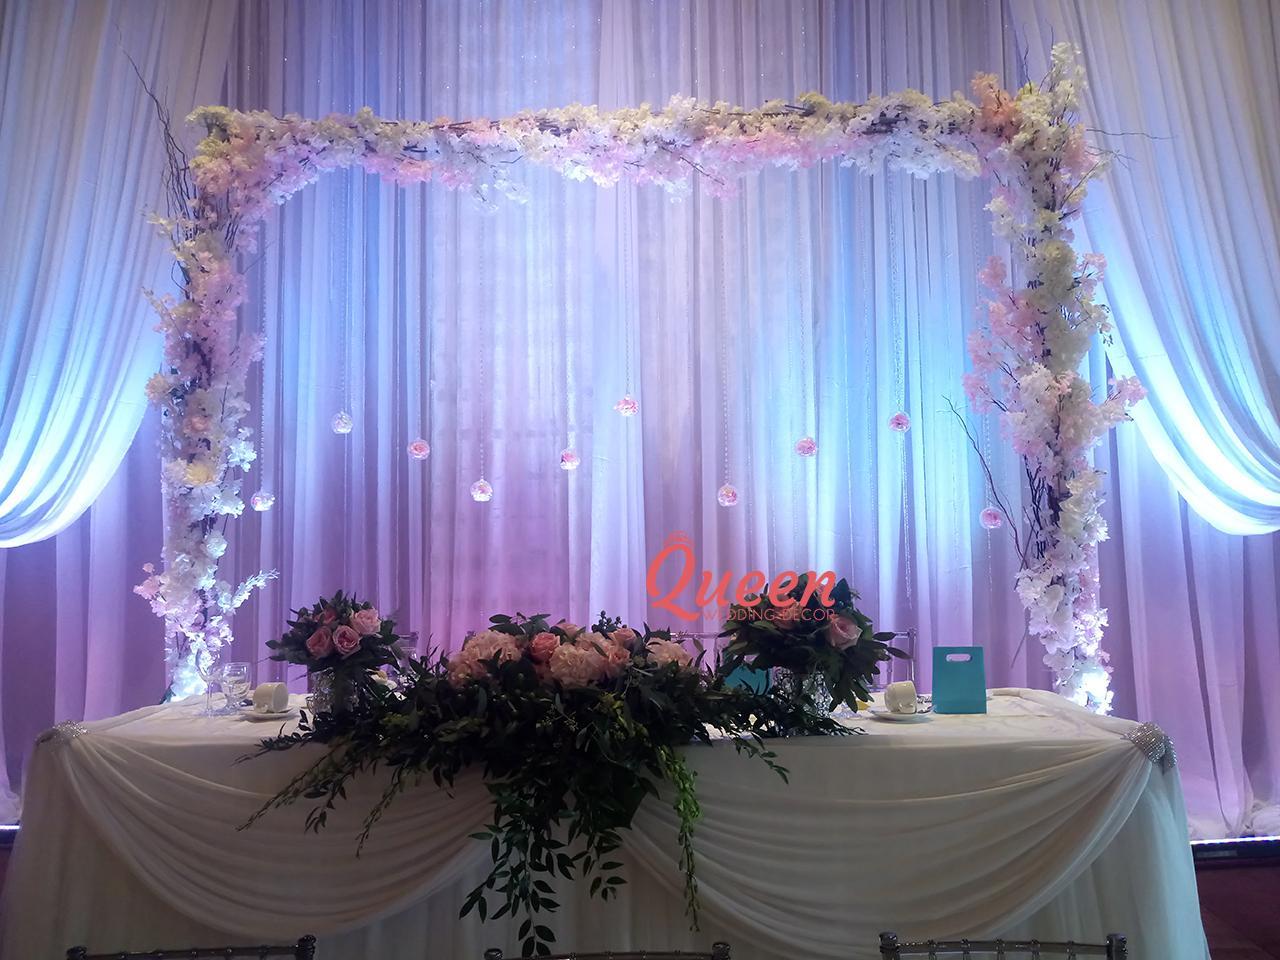 reception decor backdrop wedding decorations toronto markham and mississauga. Black Bedroom Furniture Sets. Home Design Ideas